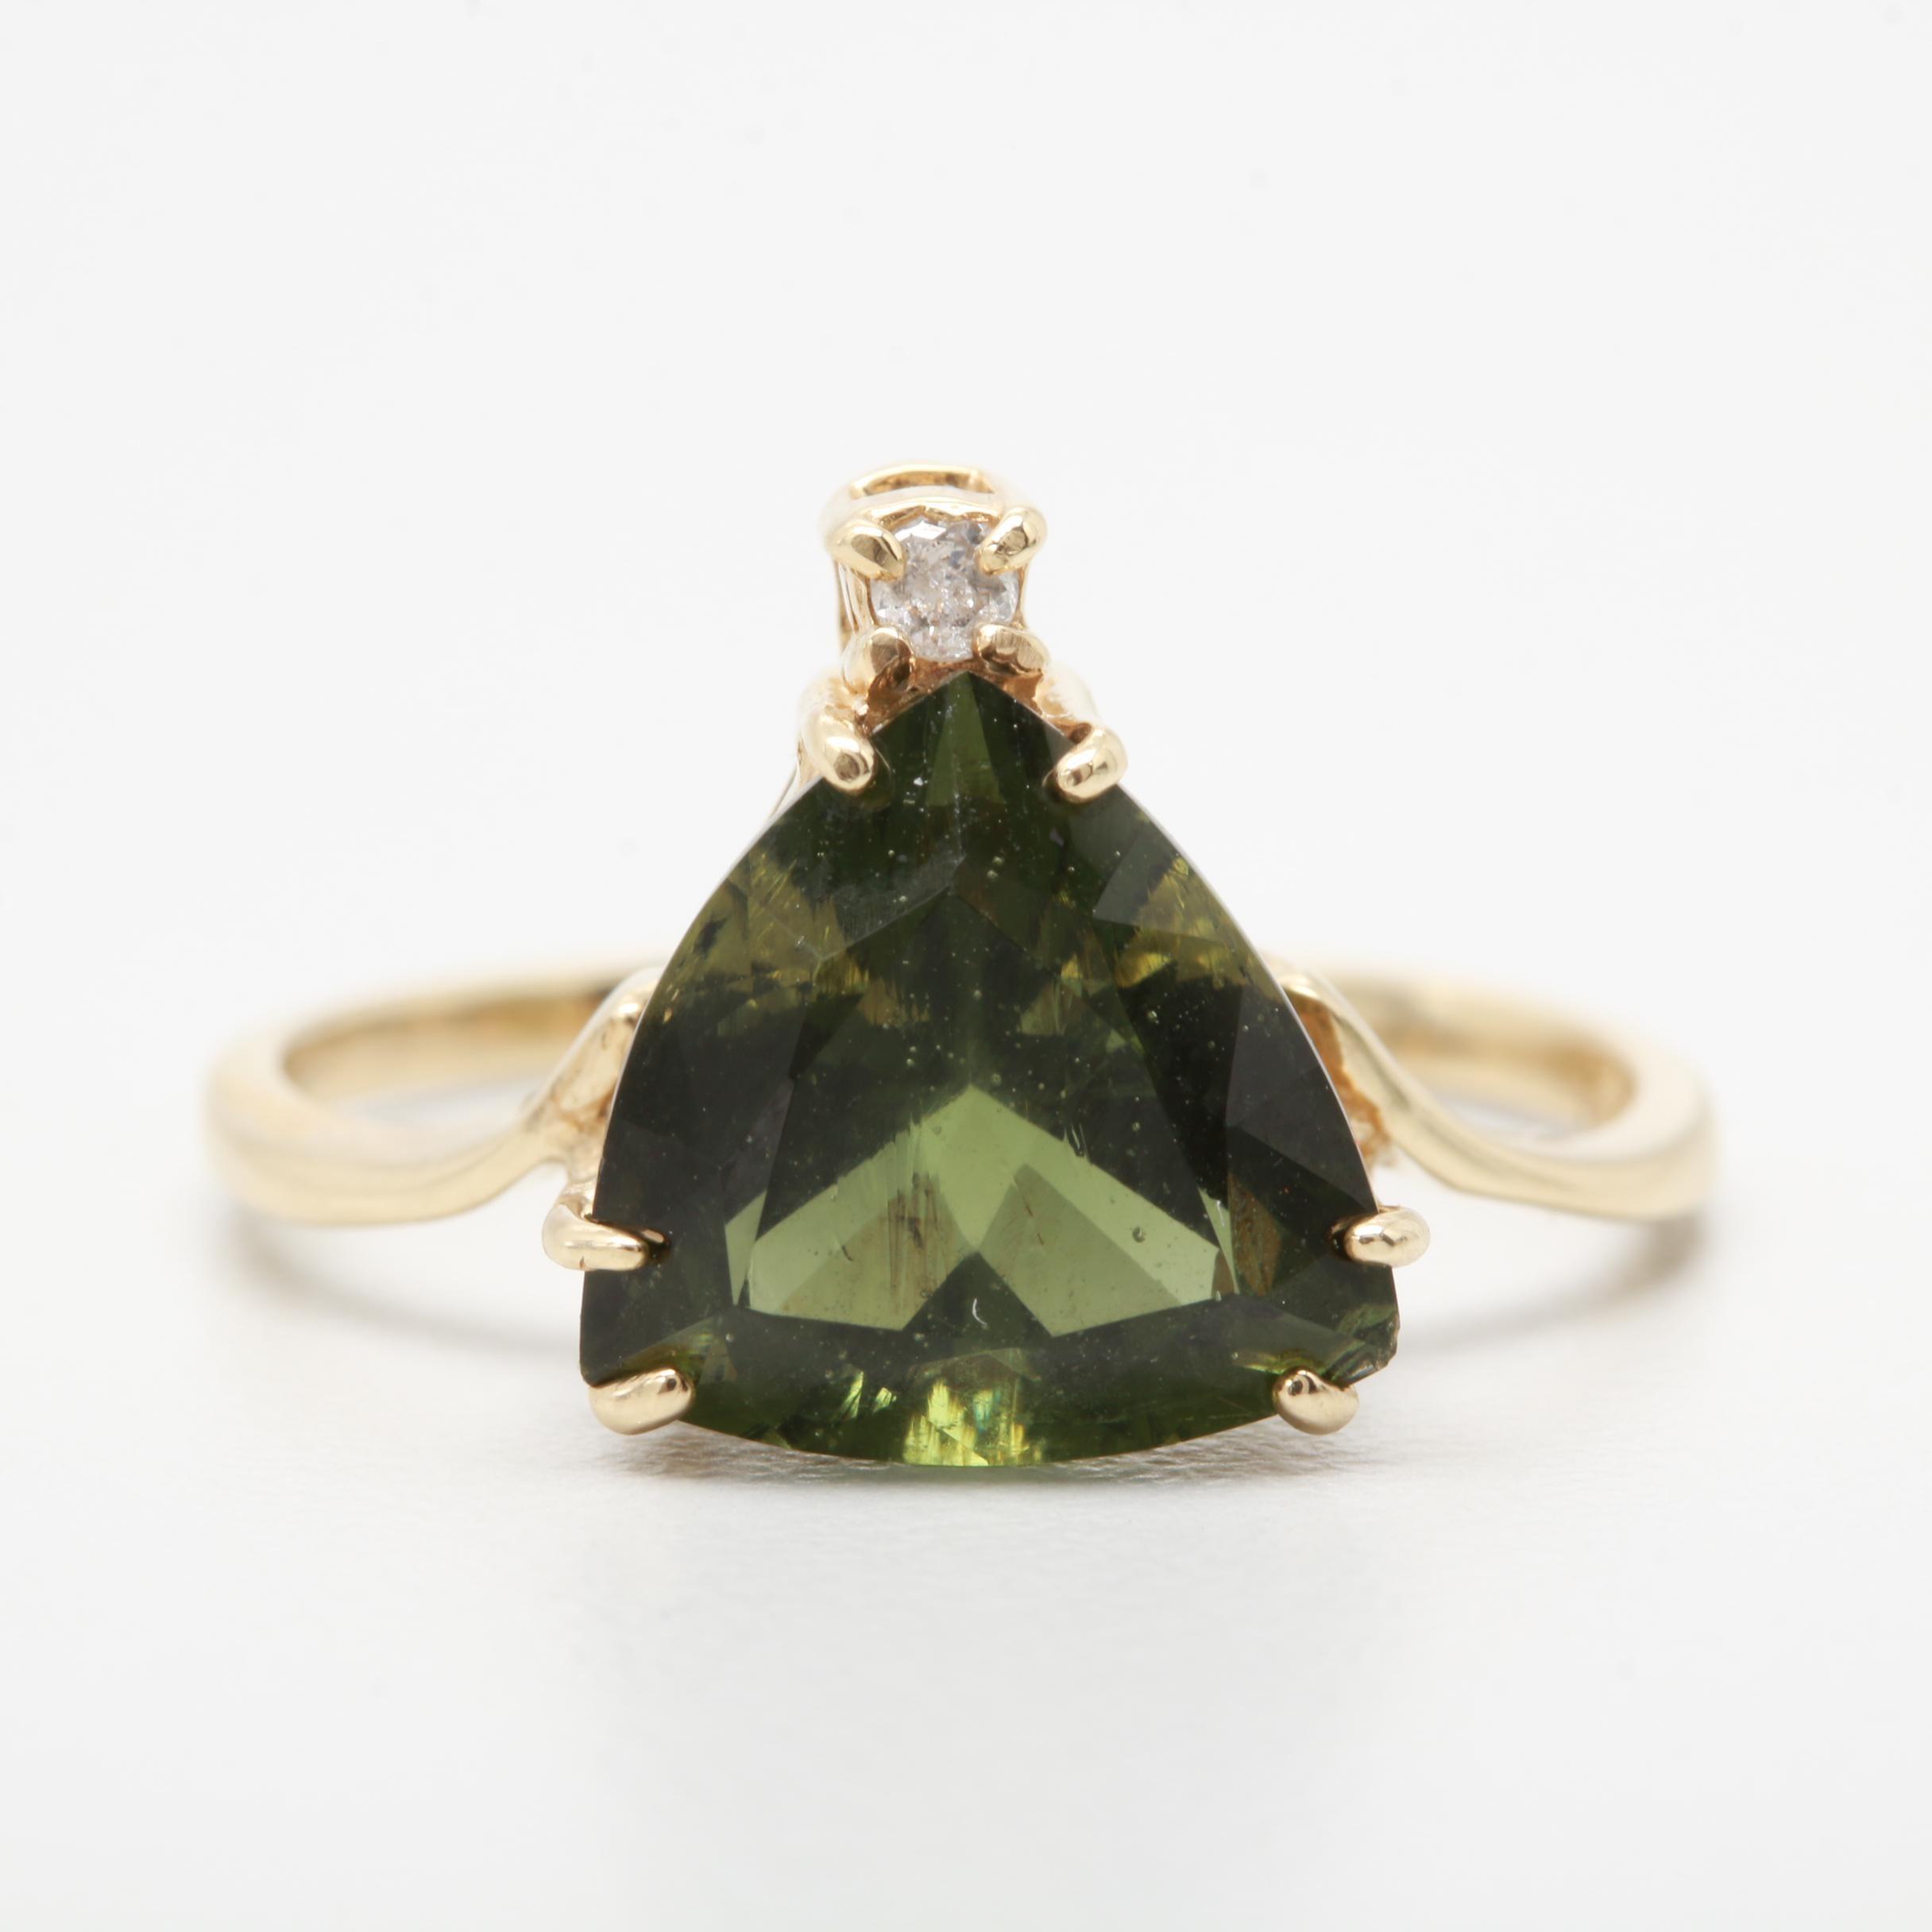 14K Yellow Gold Moldavite and Diamond Ring